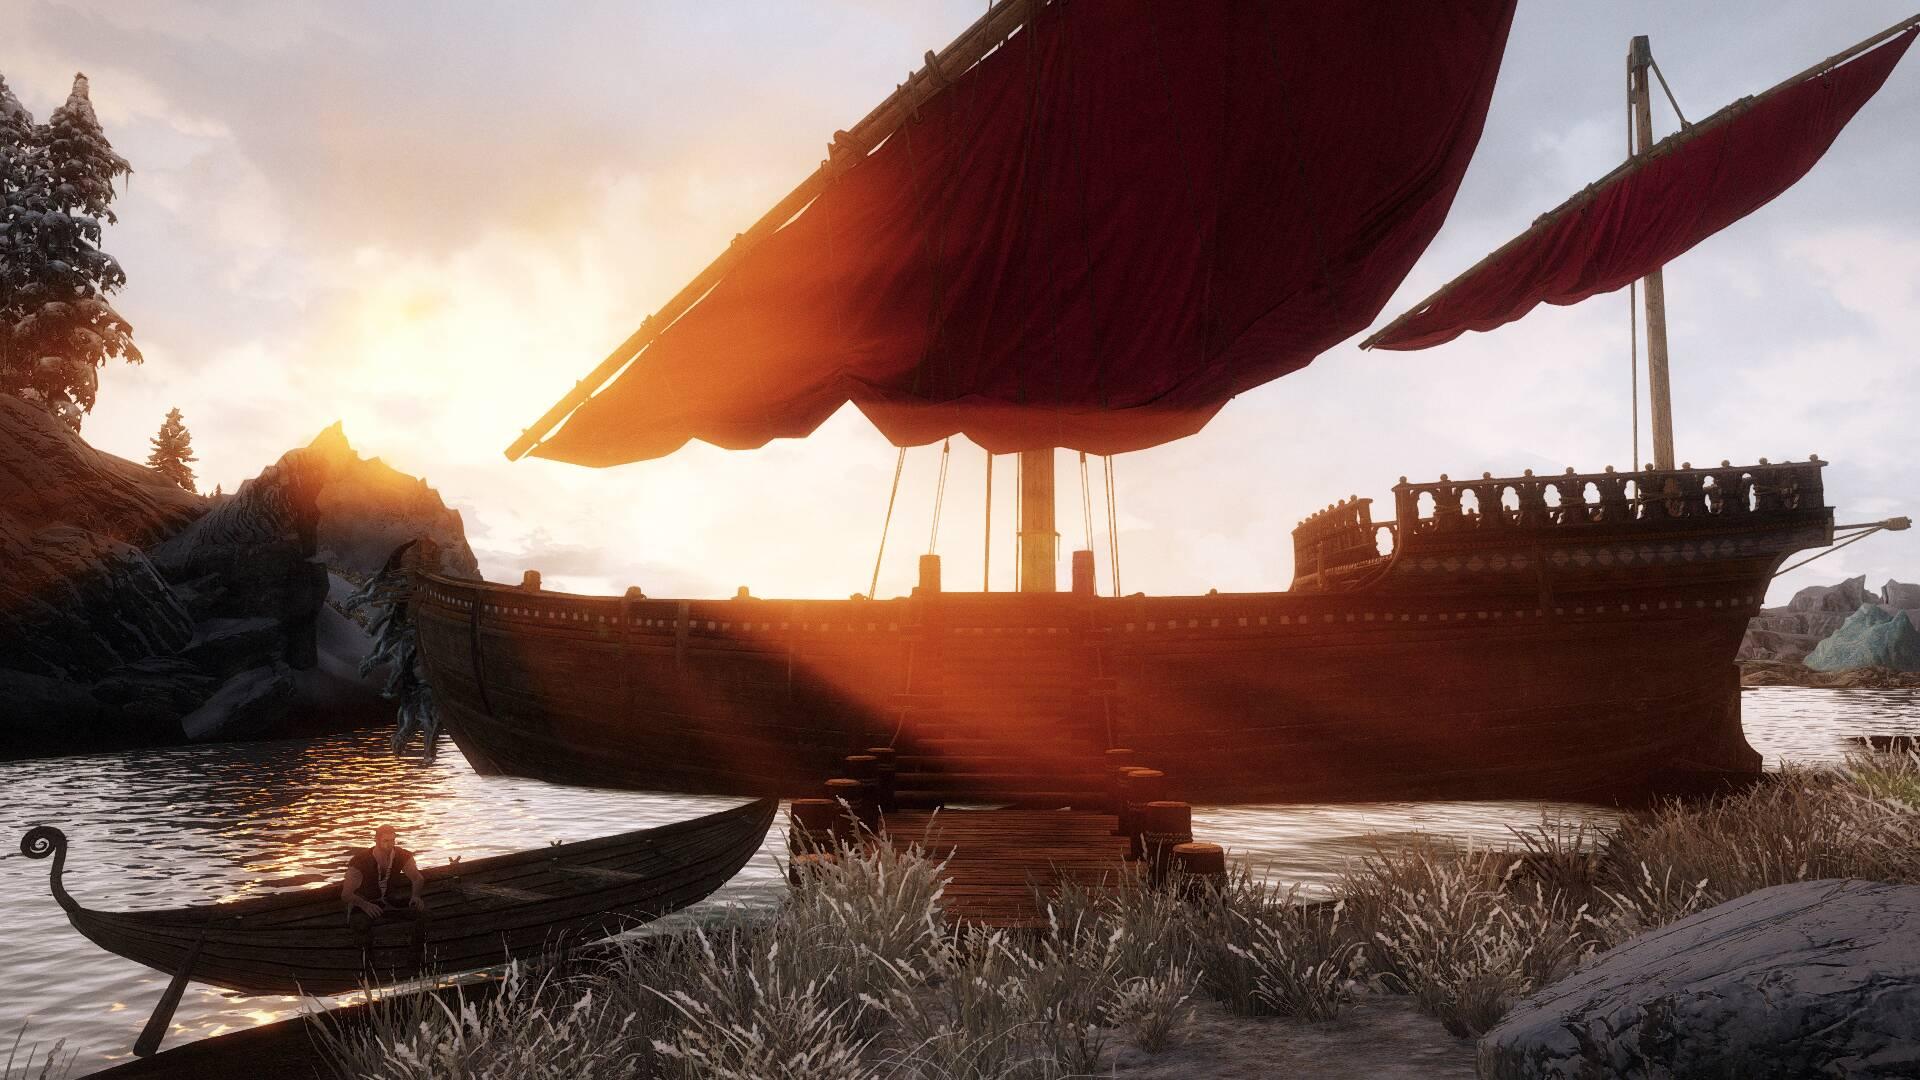 The Elder's Scrolls V Skyrim